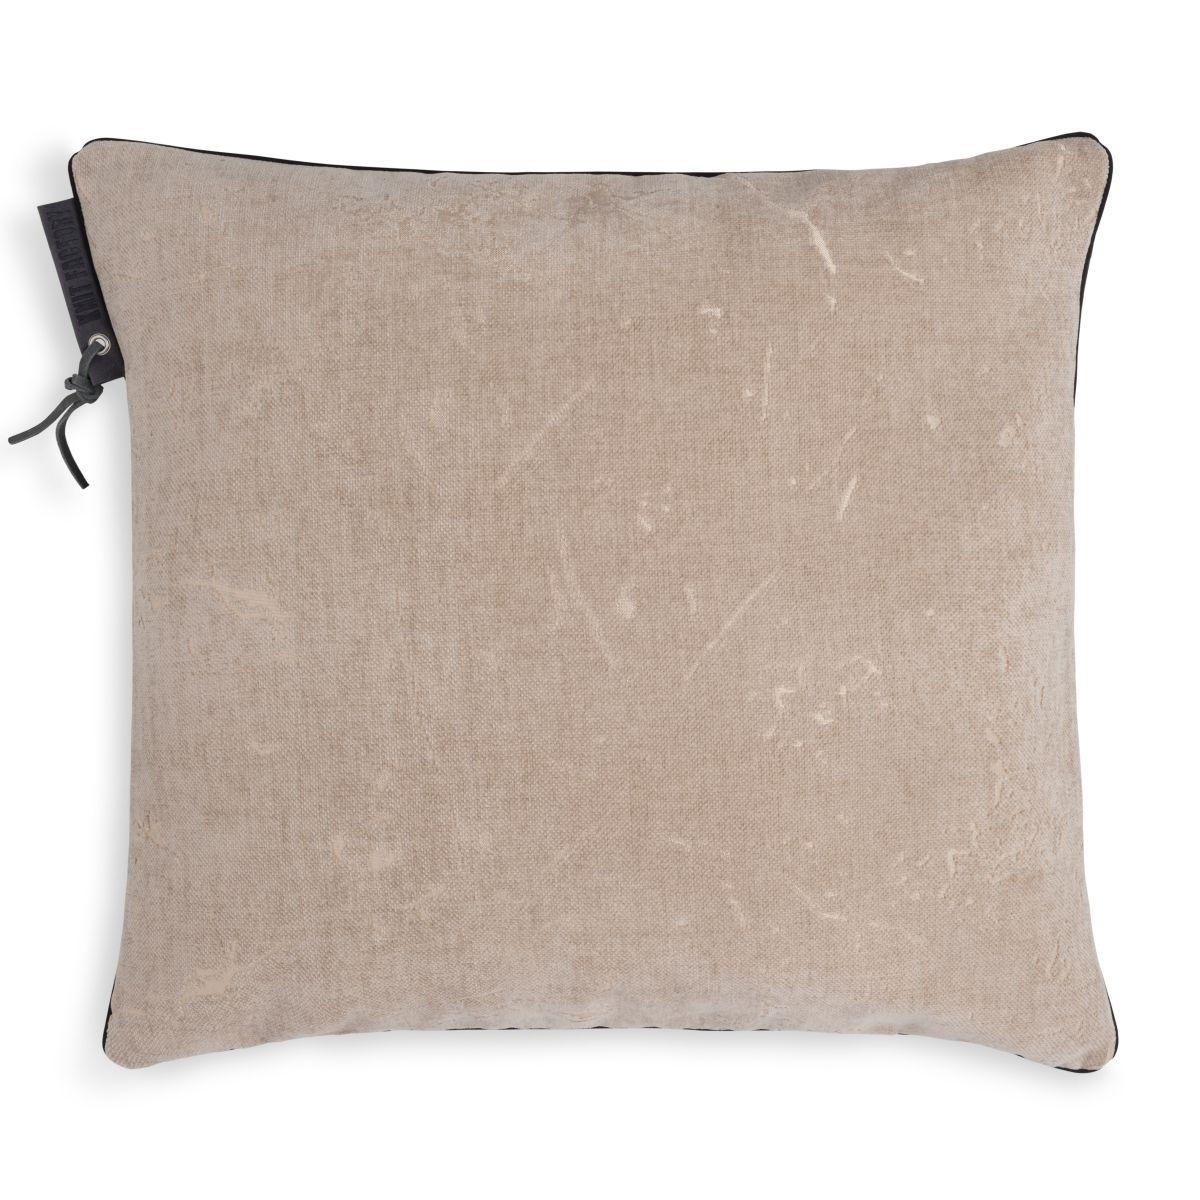 knit factory 1421212 james kussen 50x50 beige 1